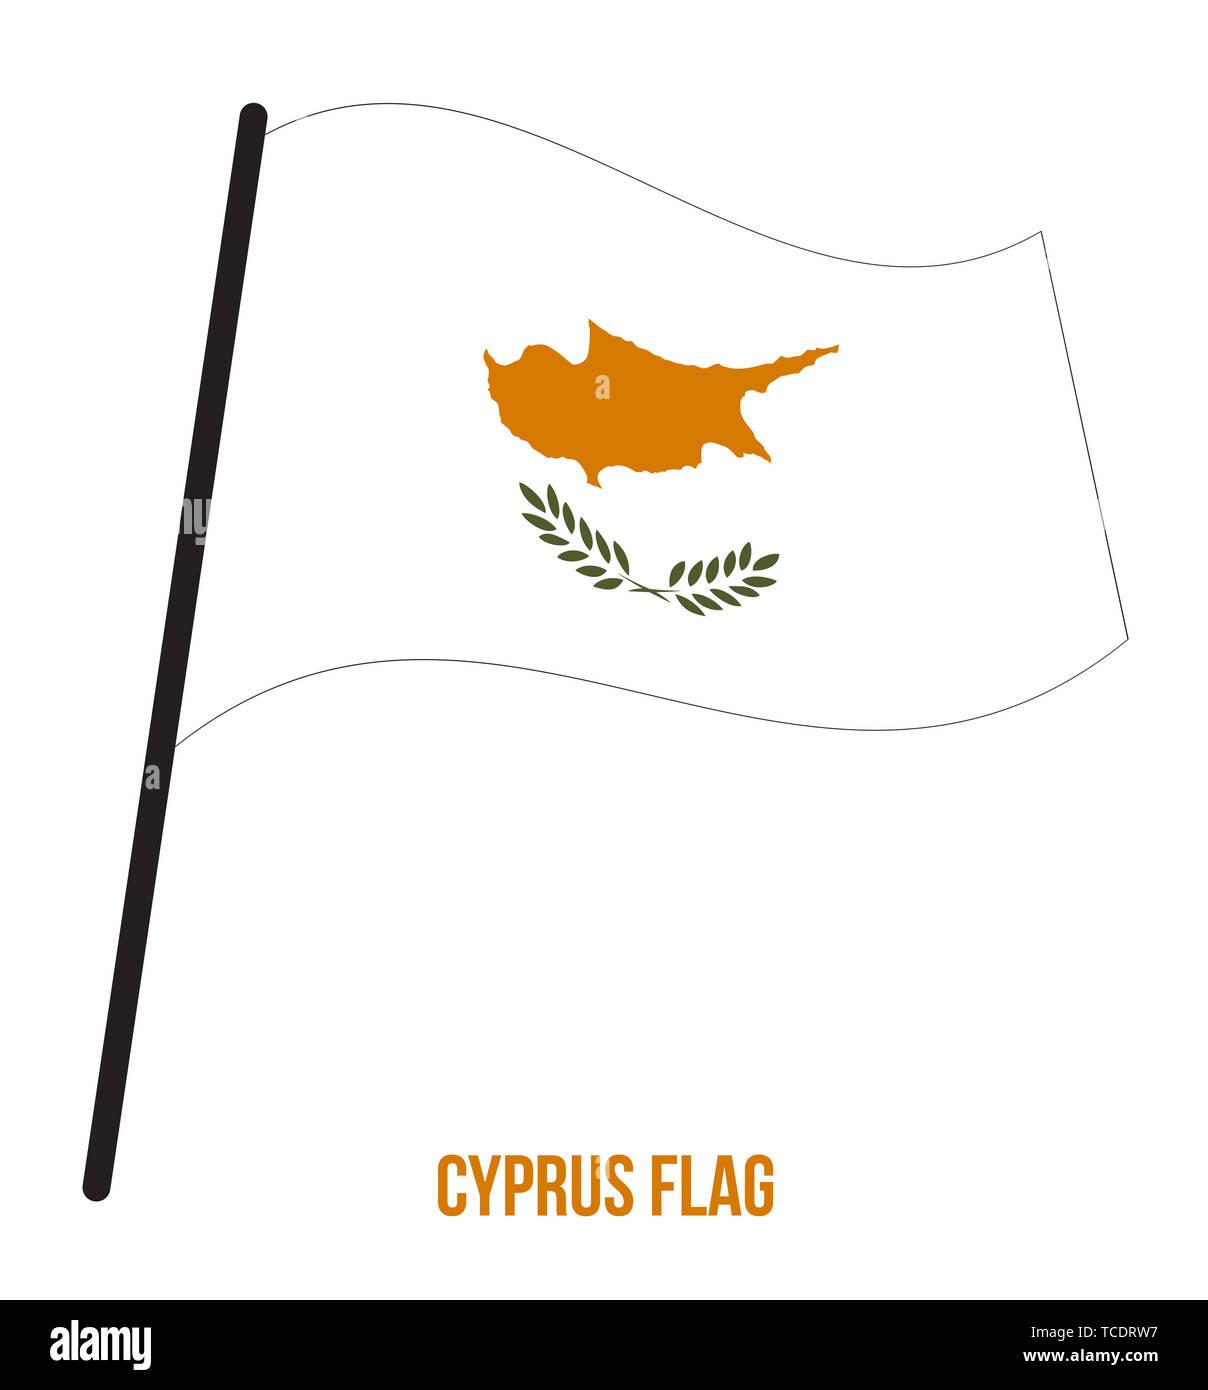 Cyprus Flag Waving Vector Illustration on White Background. Cyprus National Flag. - Stock Image